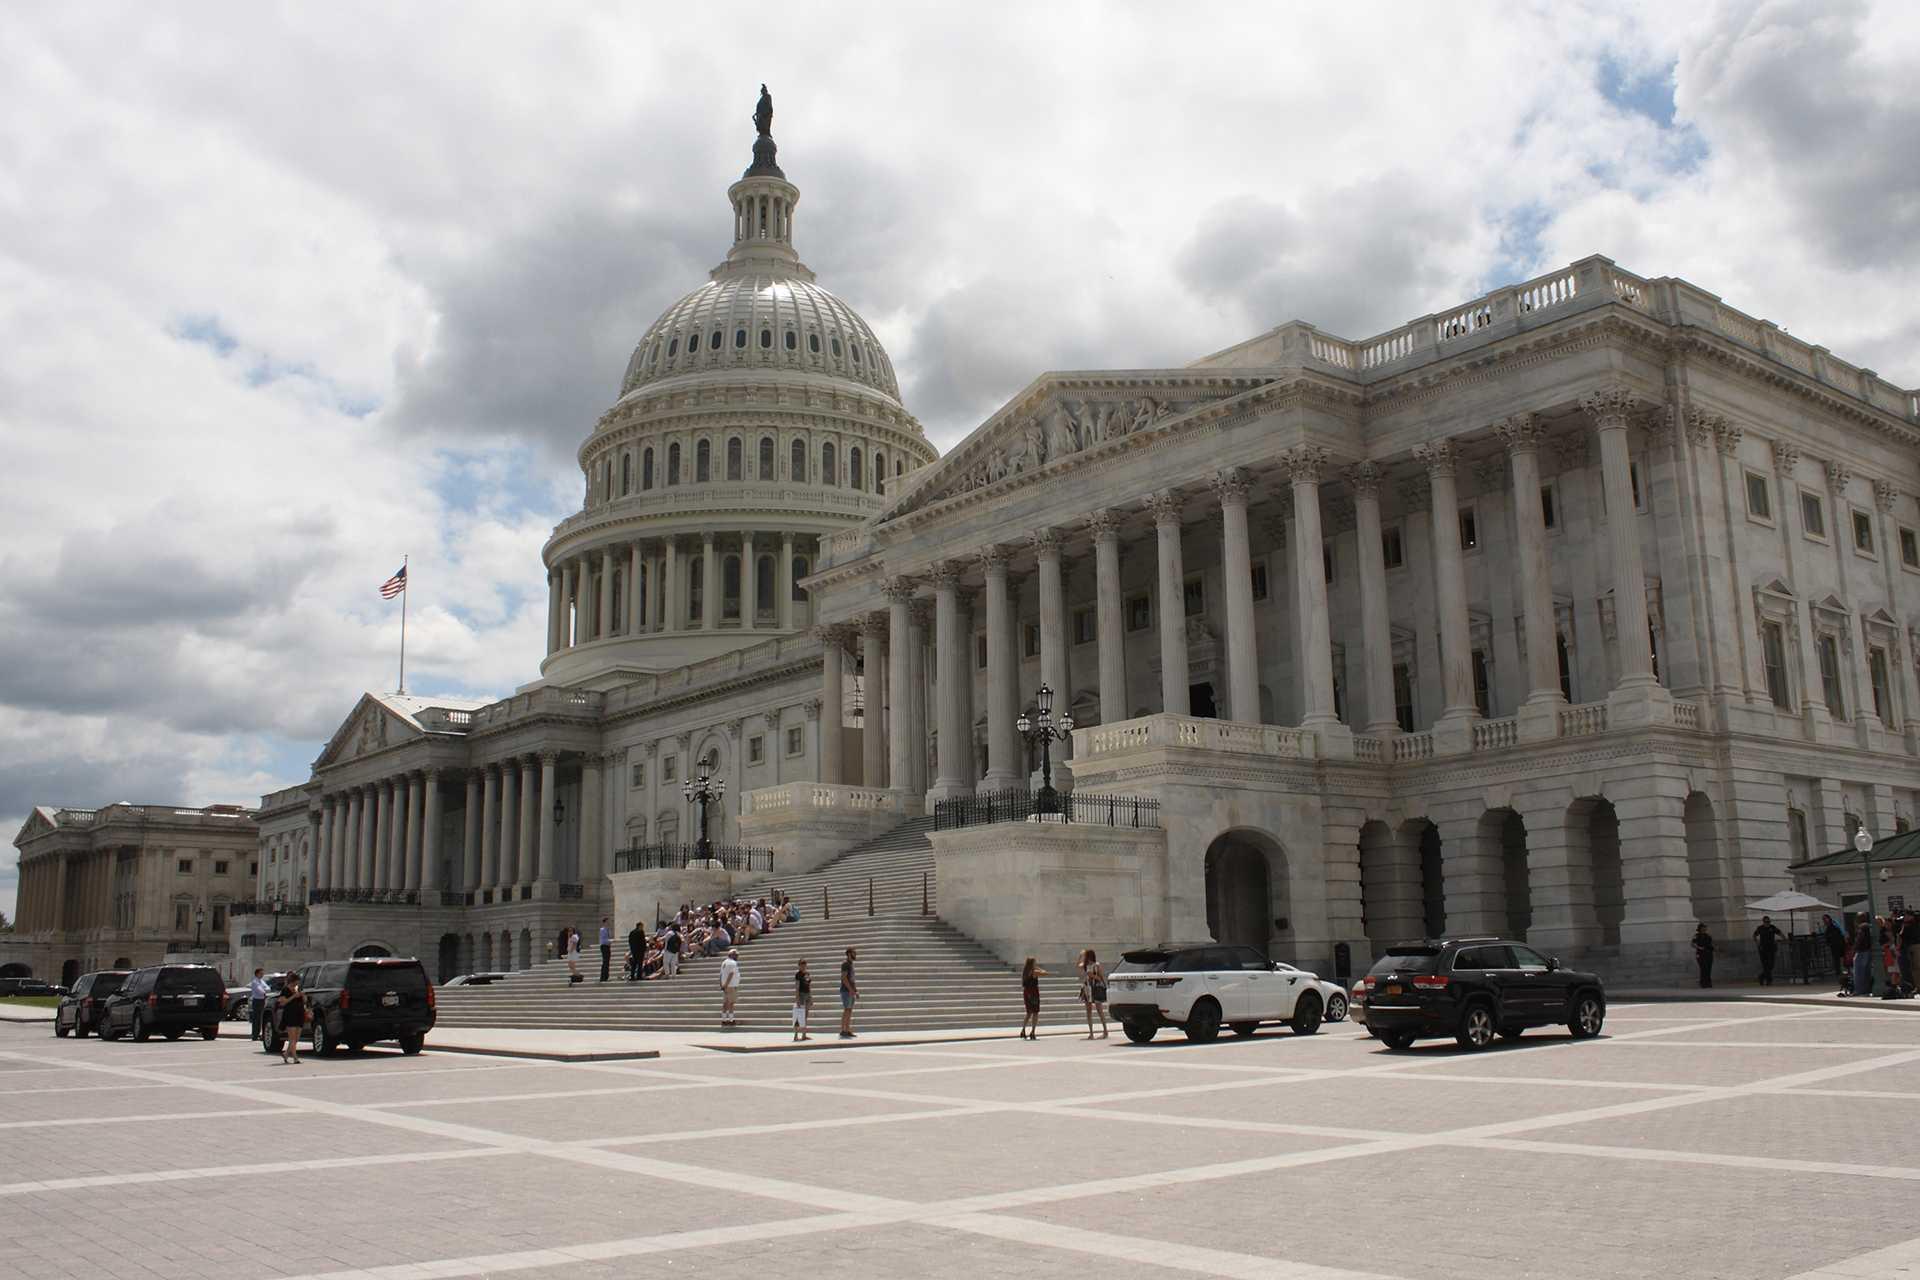 A view of the U.S. Capitol Building on July 25, 2017 in Washington, D.C. (Evan Golub/Zuma Press/TNS)